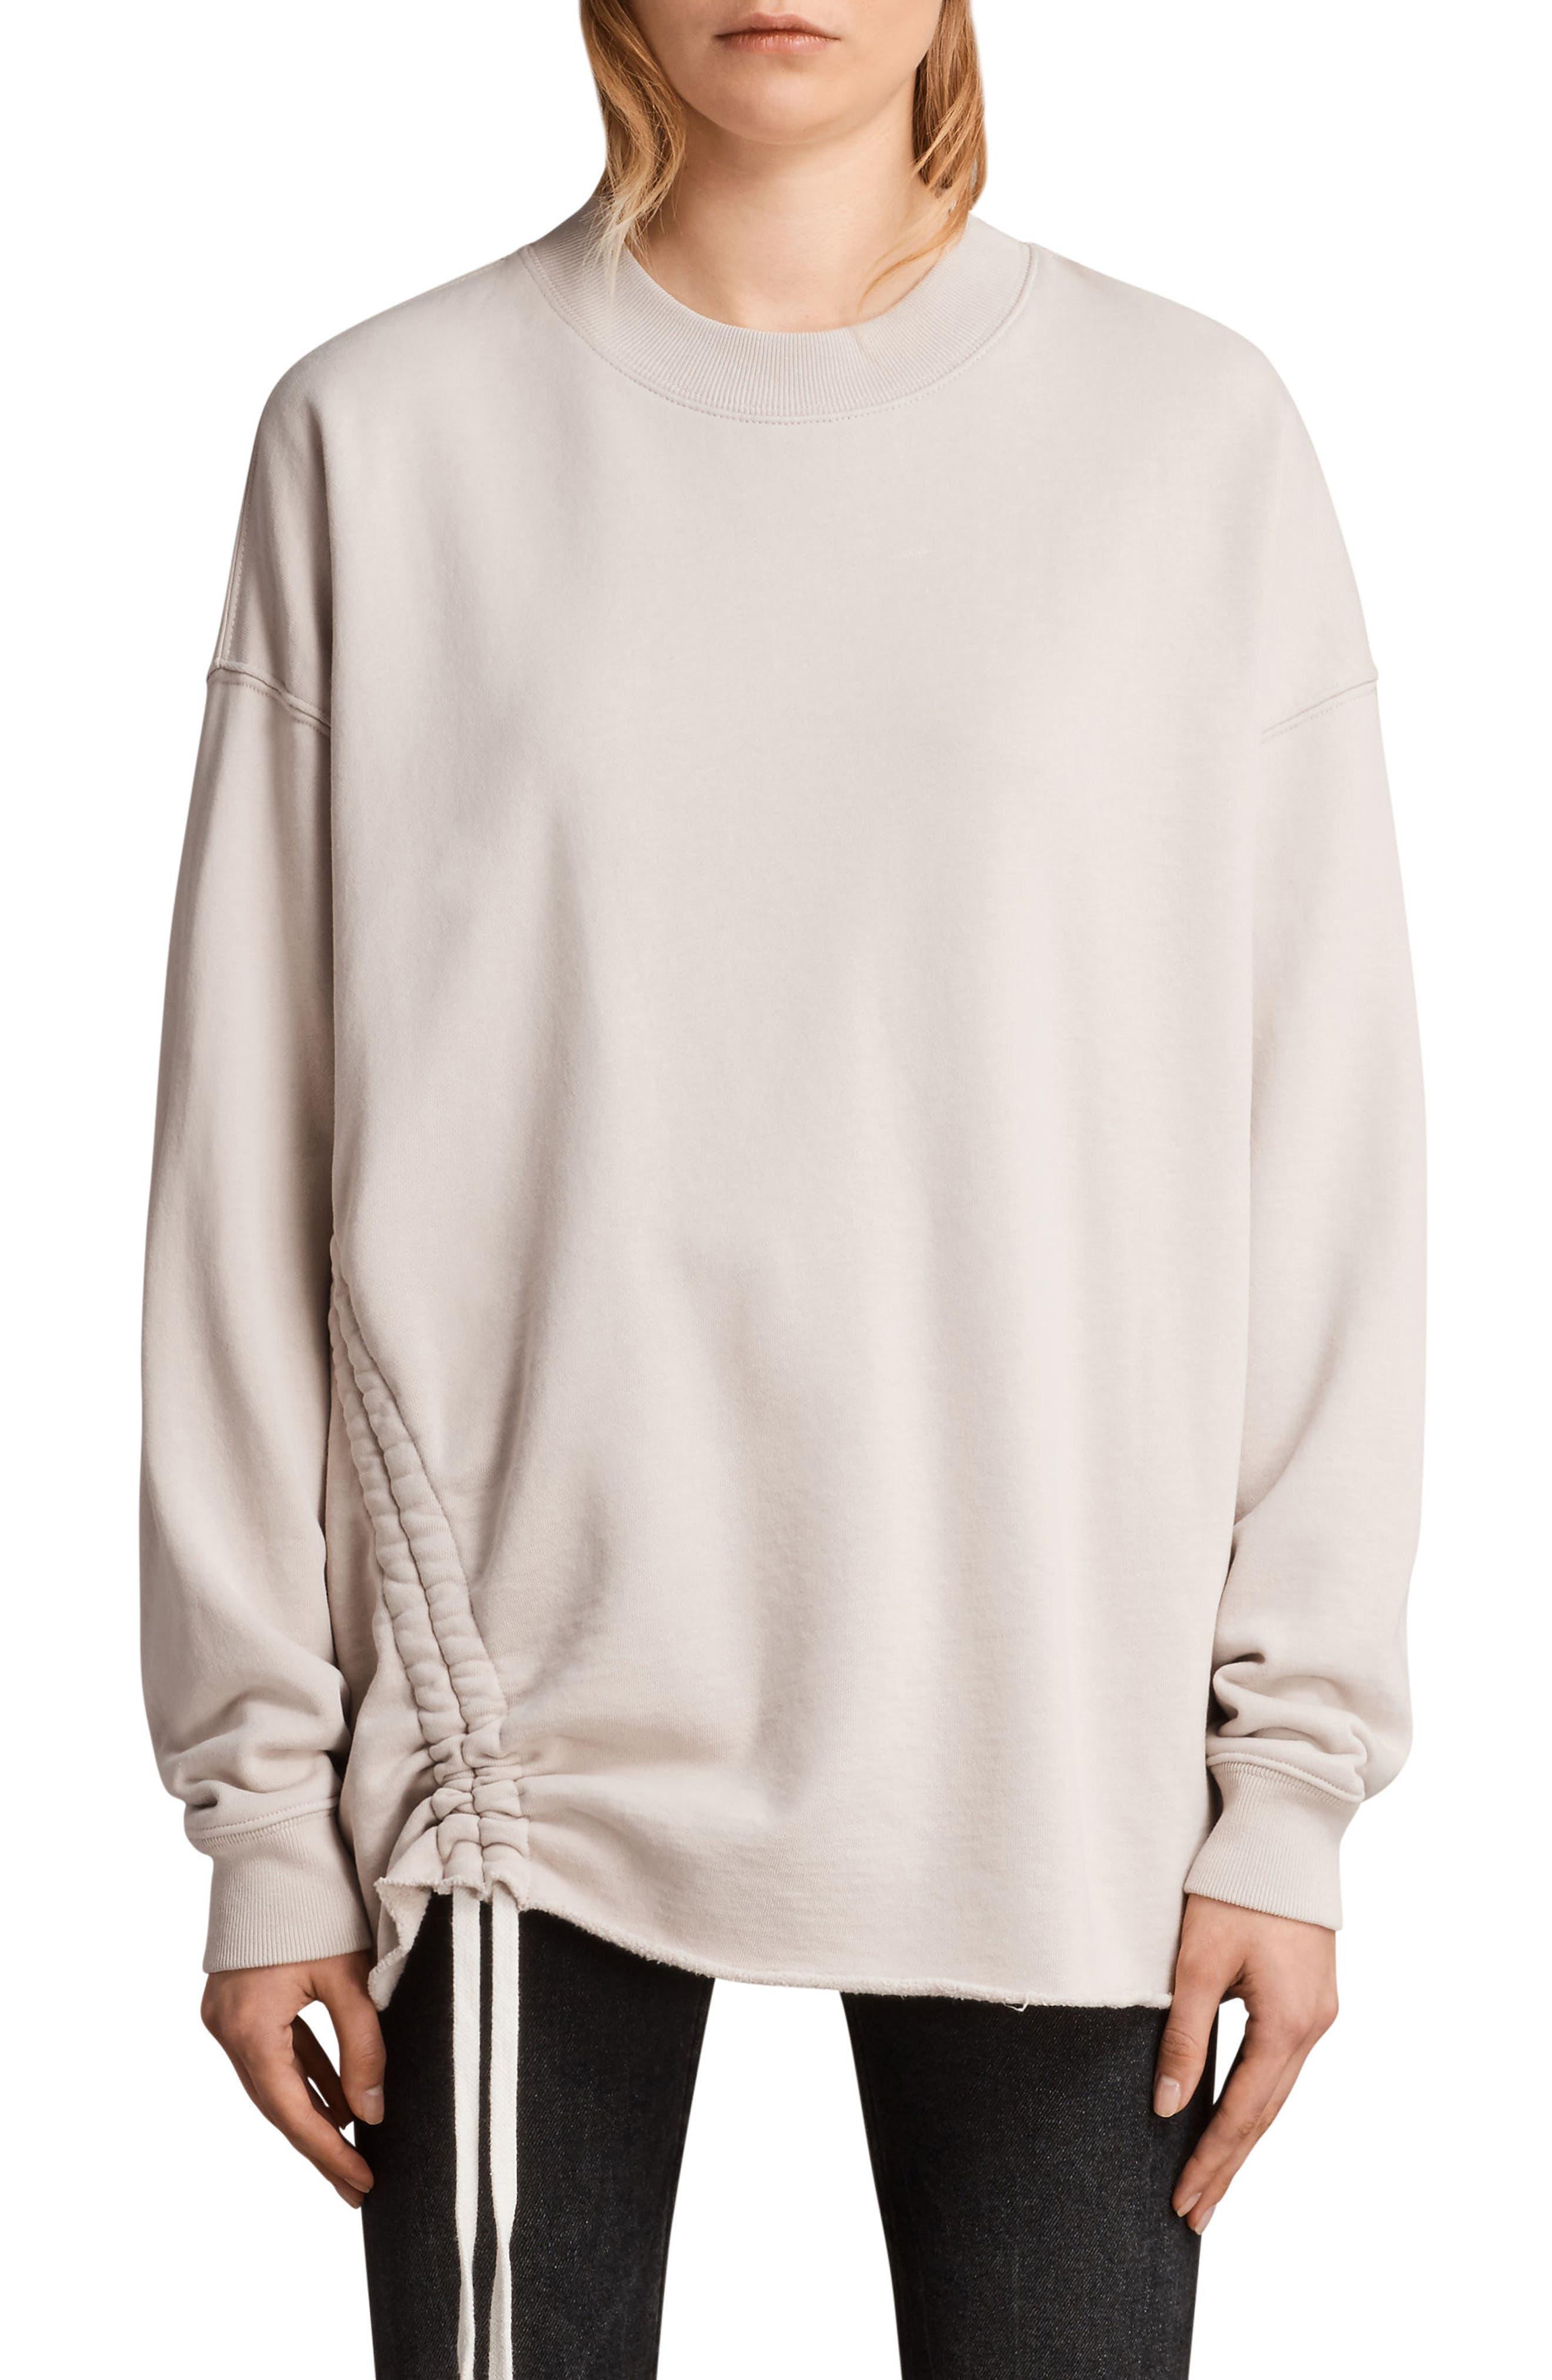 Able Sweatshirt,                         Main,                         color,